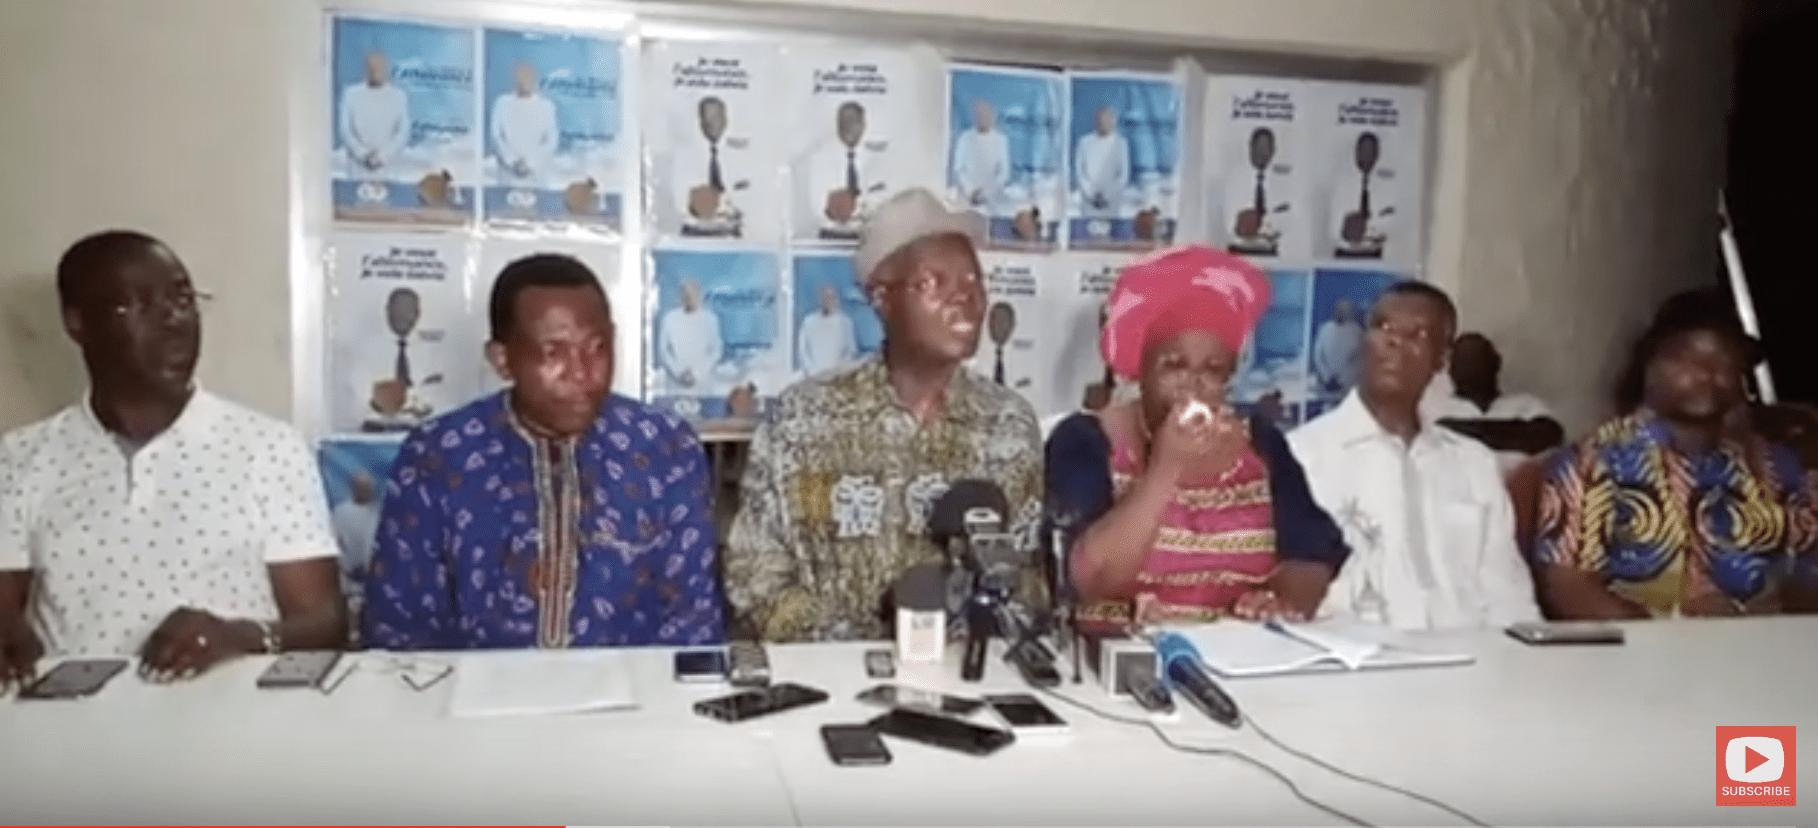 RESULTAT ELECTION TOGO : Conférence de presse du candidat Agbéyomé Kodjo de la dynamique Kpodzro.